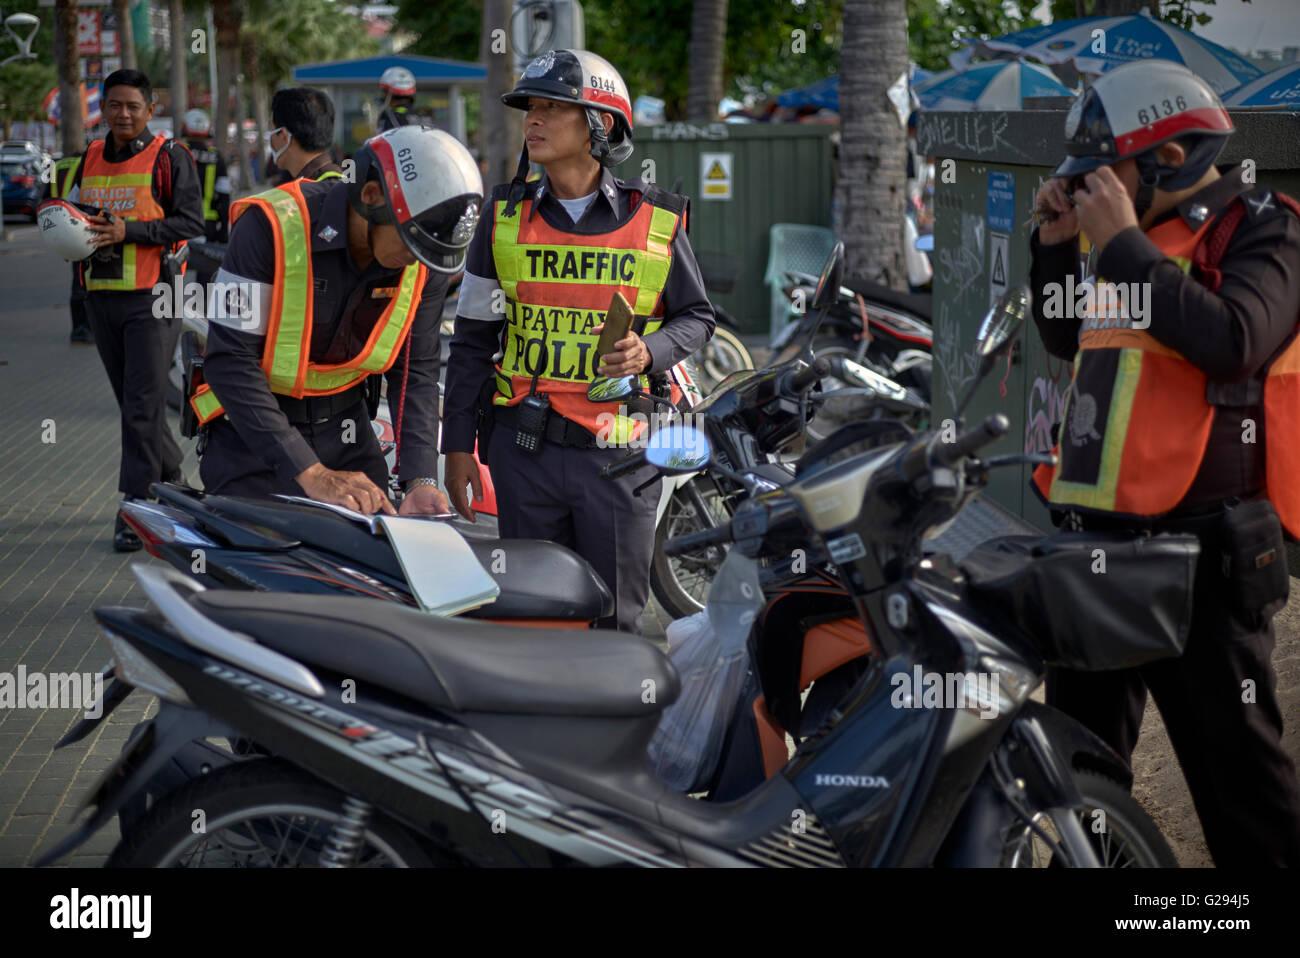 La police thaïlandaise. S. E. Asie Thaïlande Photo Stock